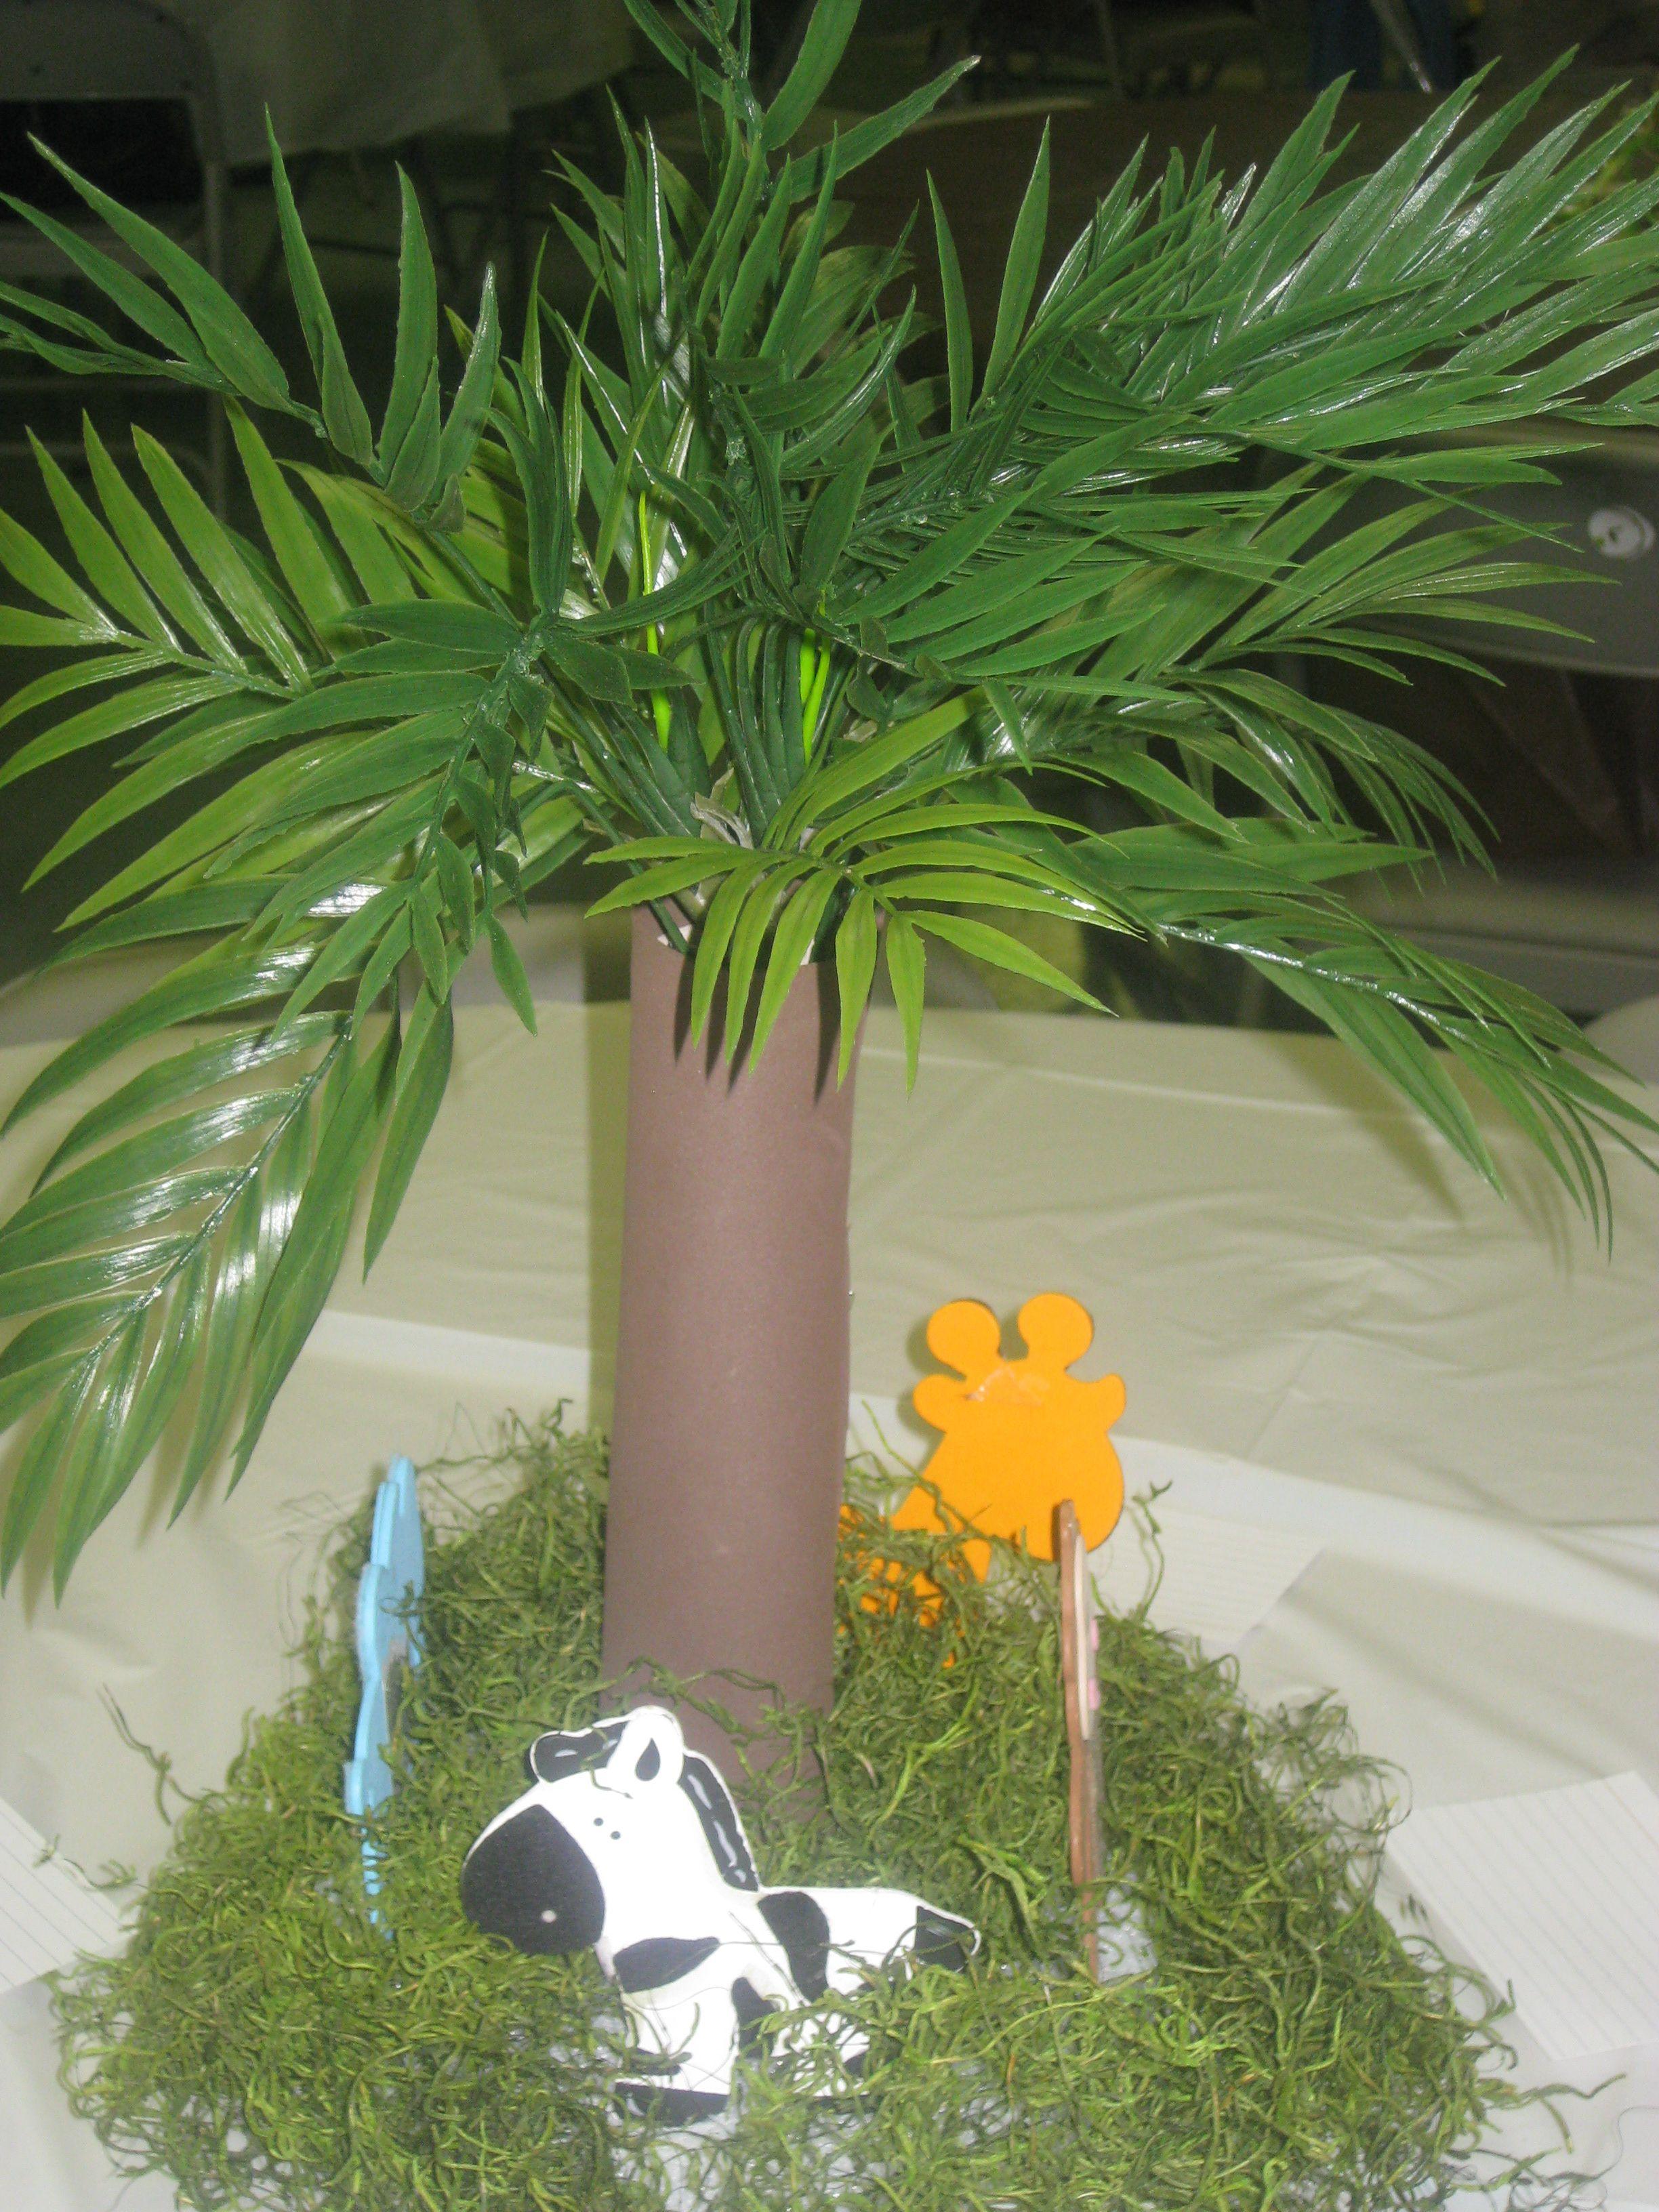 Jungle Theme Centerpiece Baby Showers Pinterest Jungle Theme Centerpieces And Birthdays